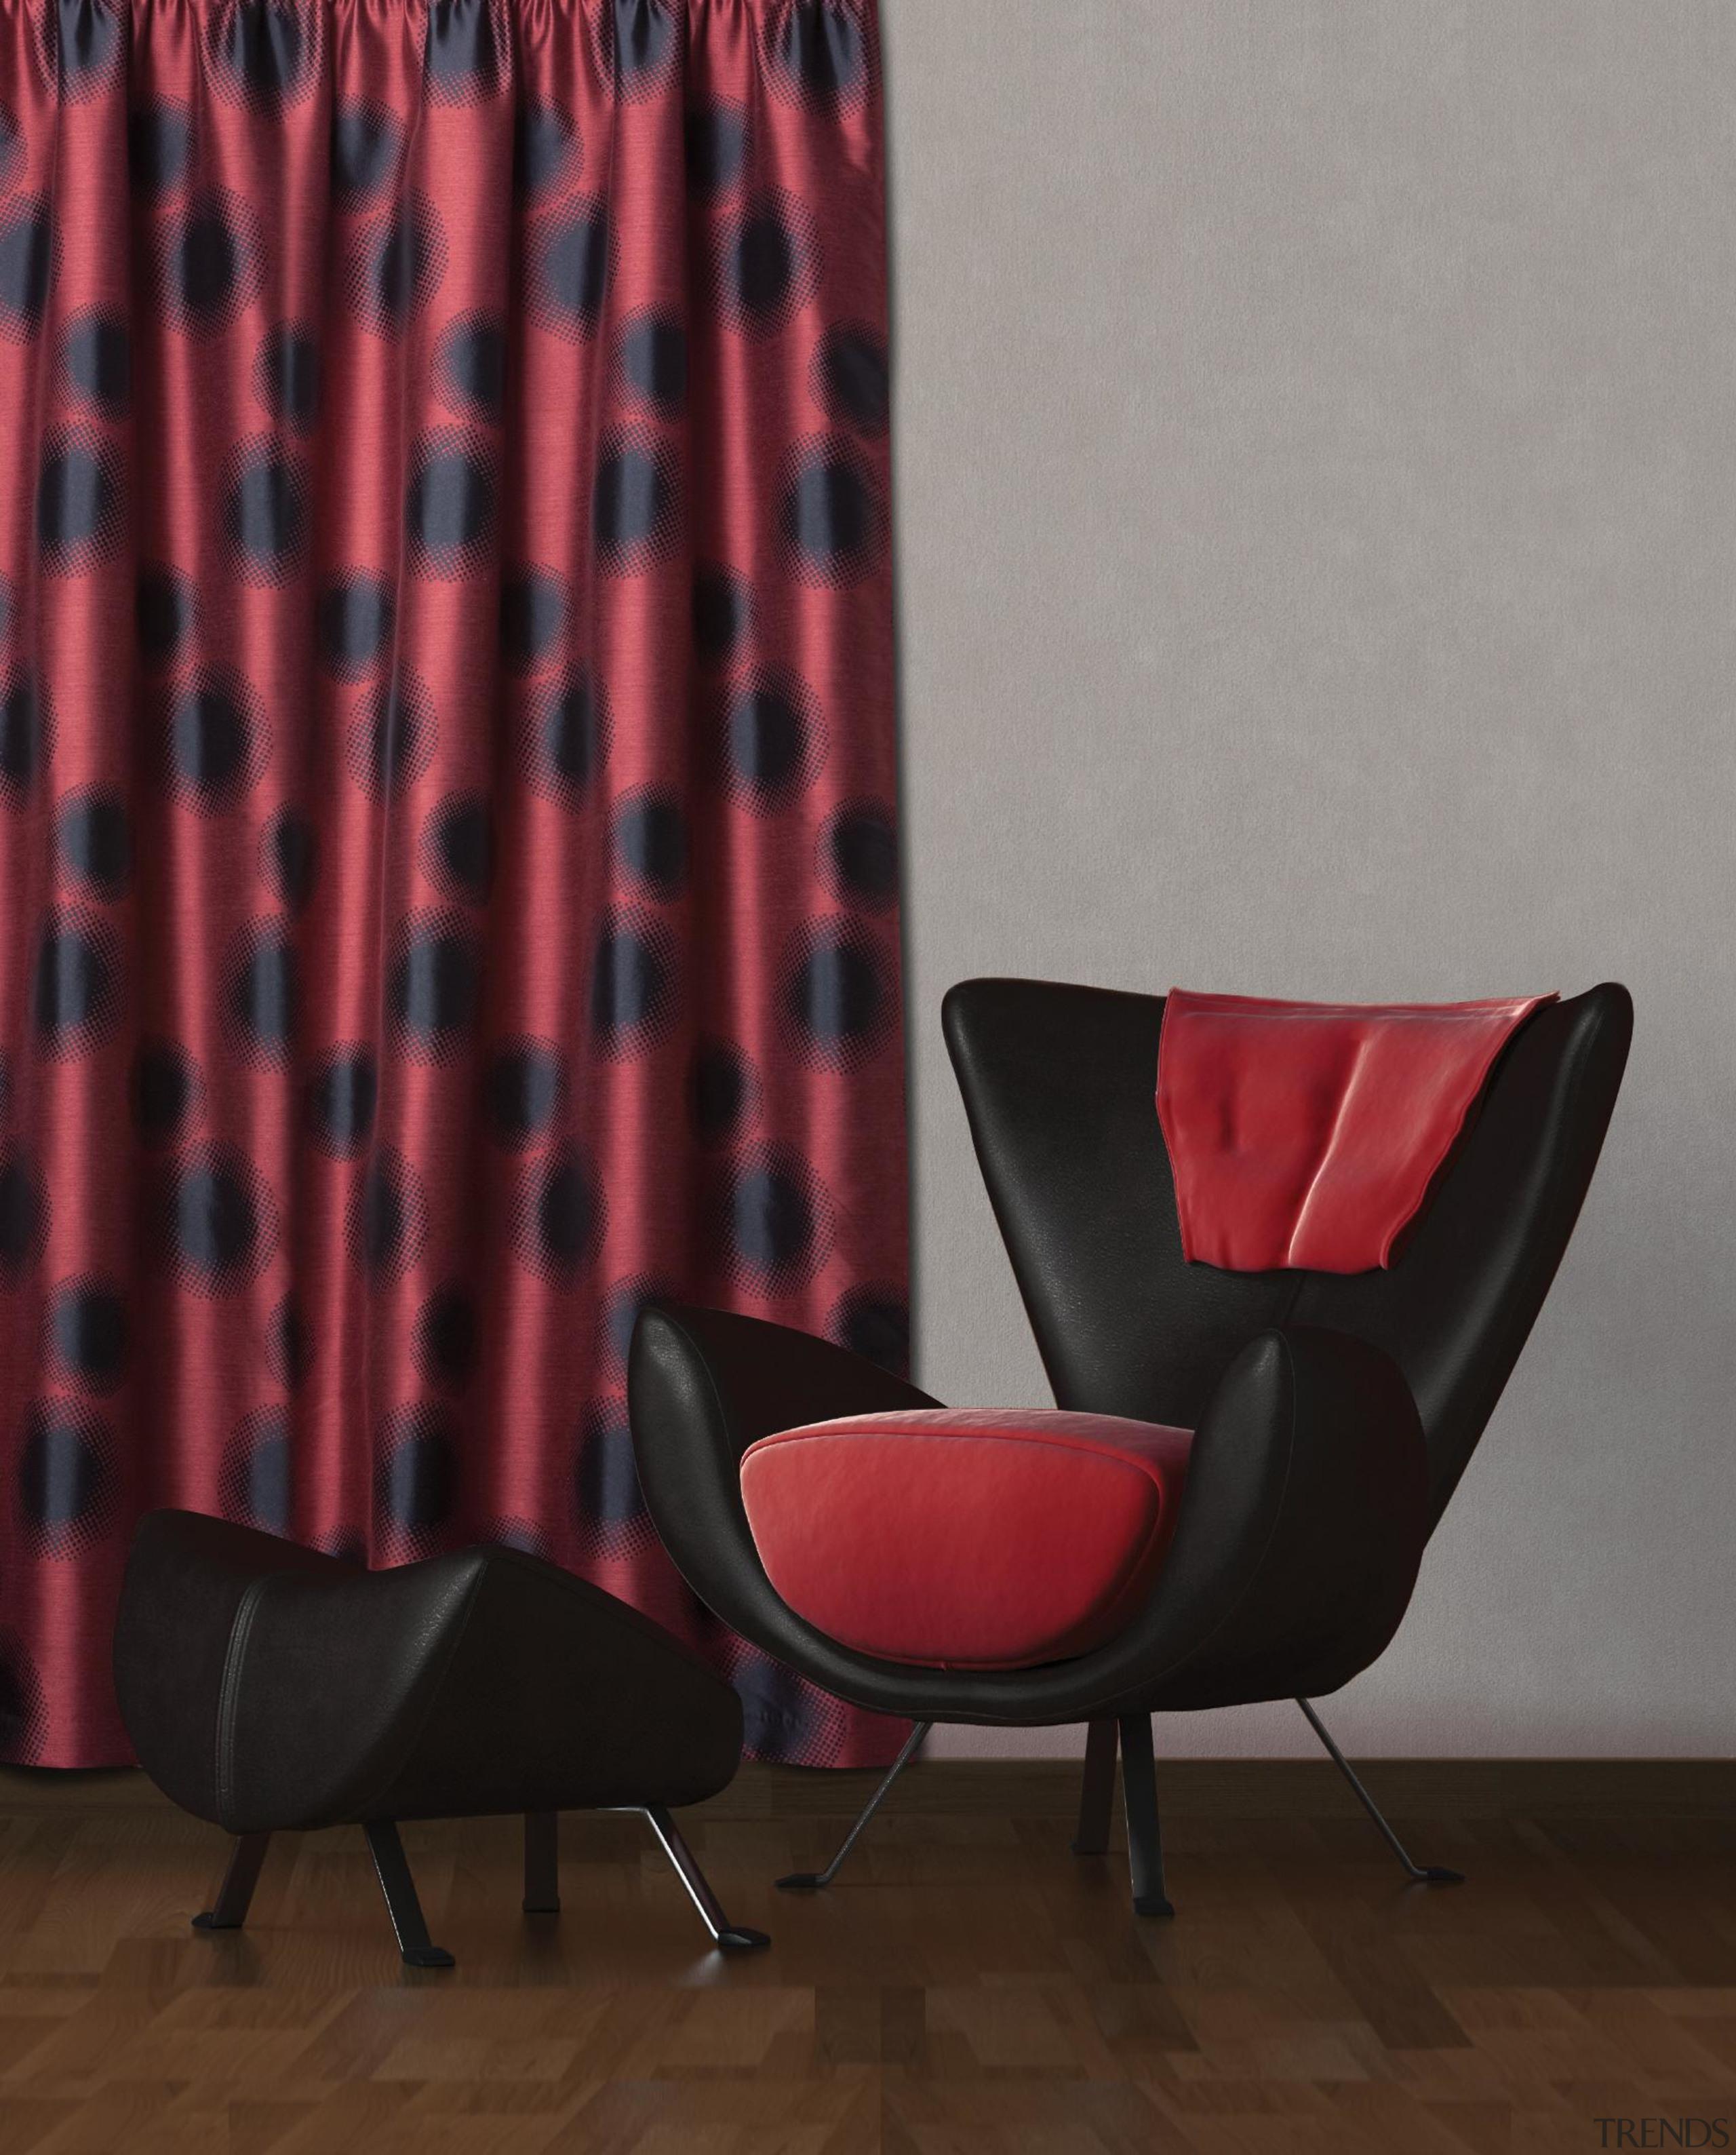 Beacon Room Flame - chair | curtain | chair, curtain, furniture, interior design, pattern, window treatment, red, gray